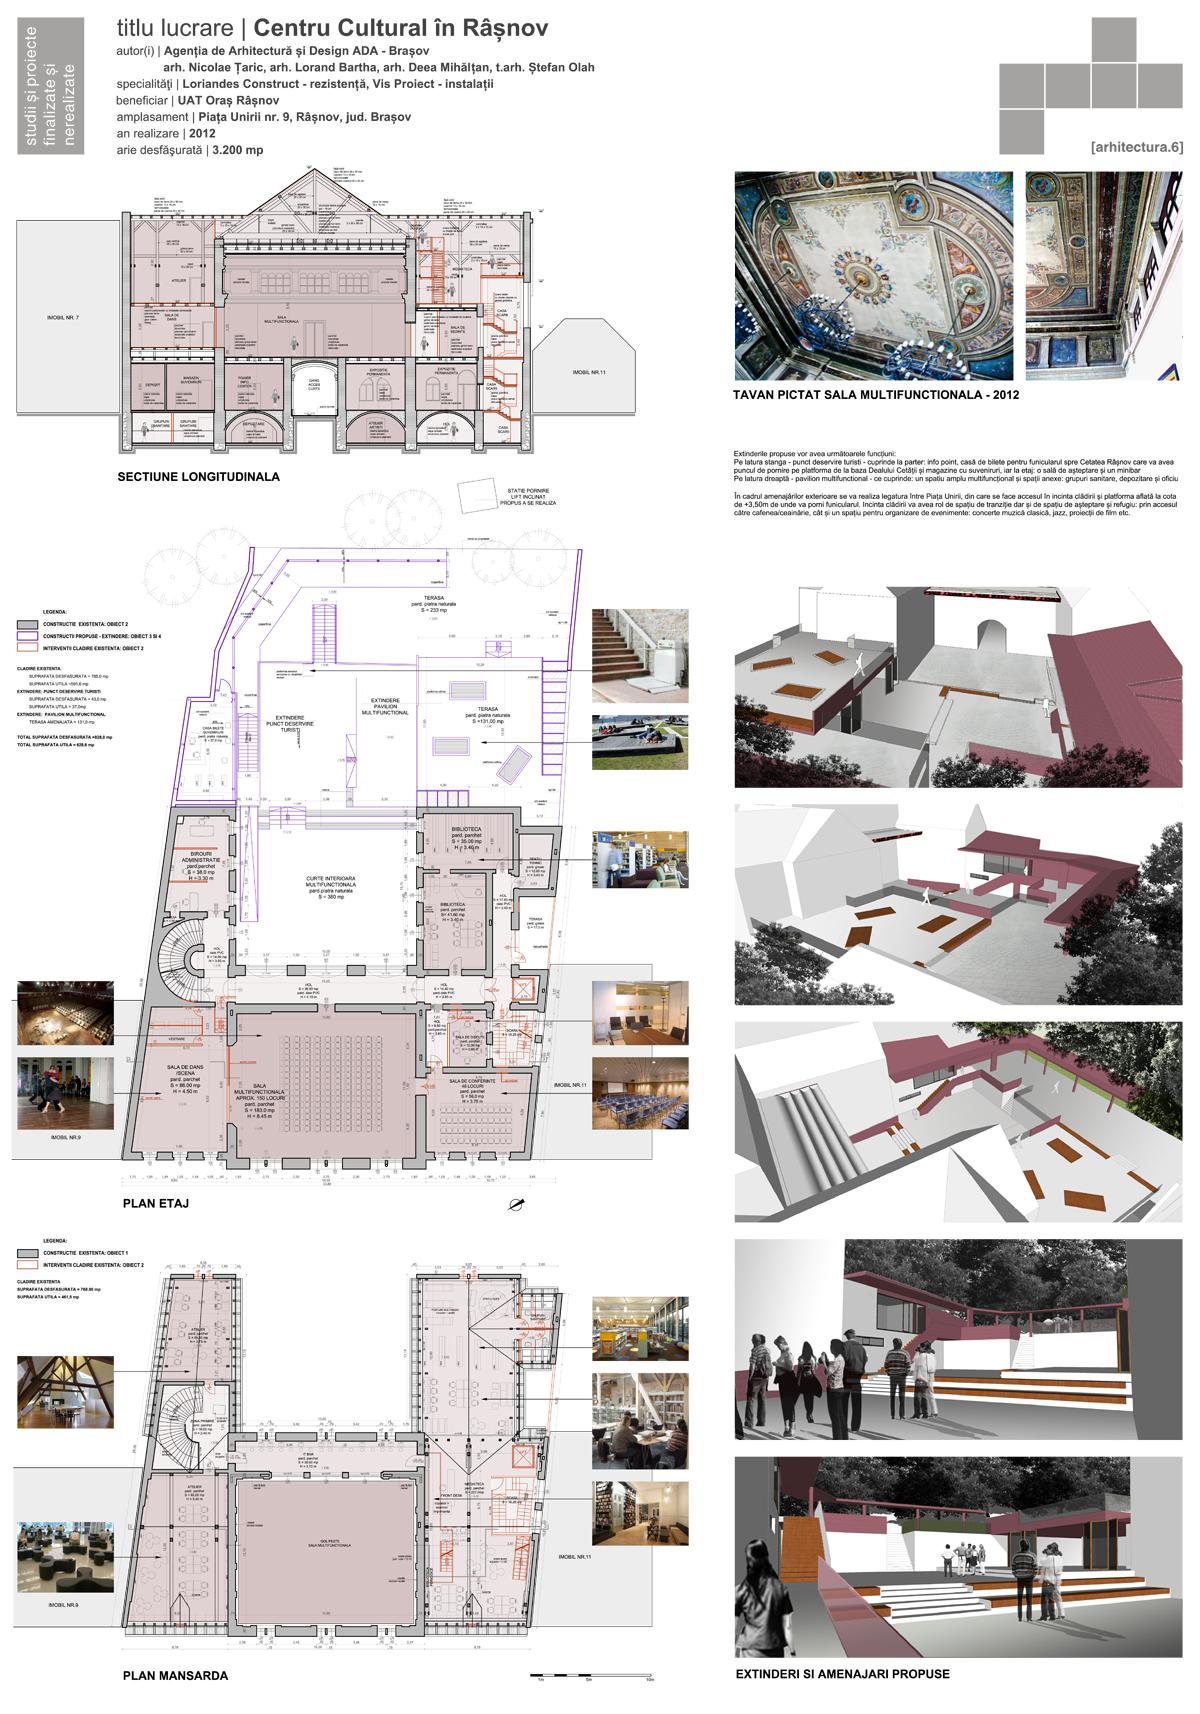 E:PROIECTE ADA0D-280286 - Bienala 2014 - Arhitectura 62 - et